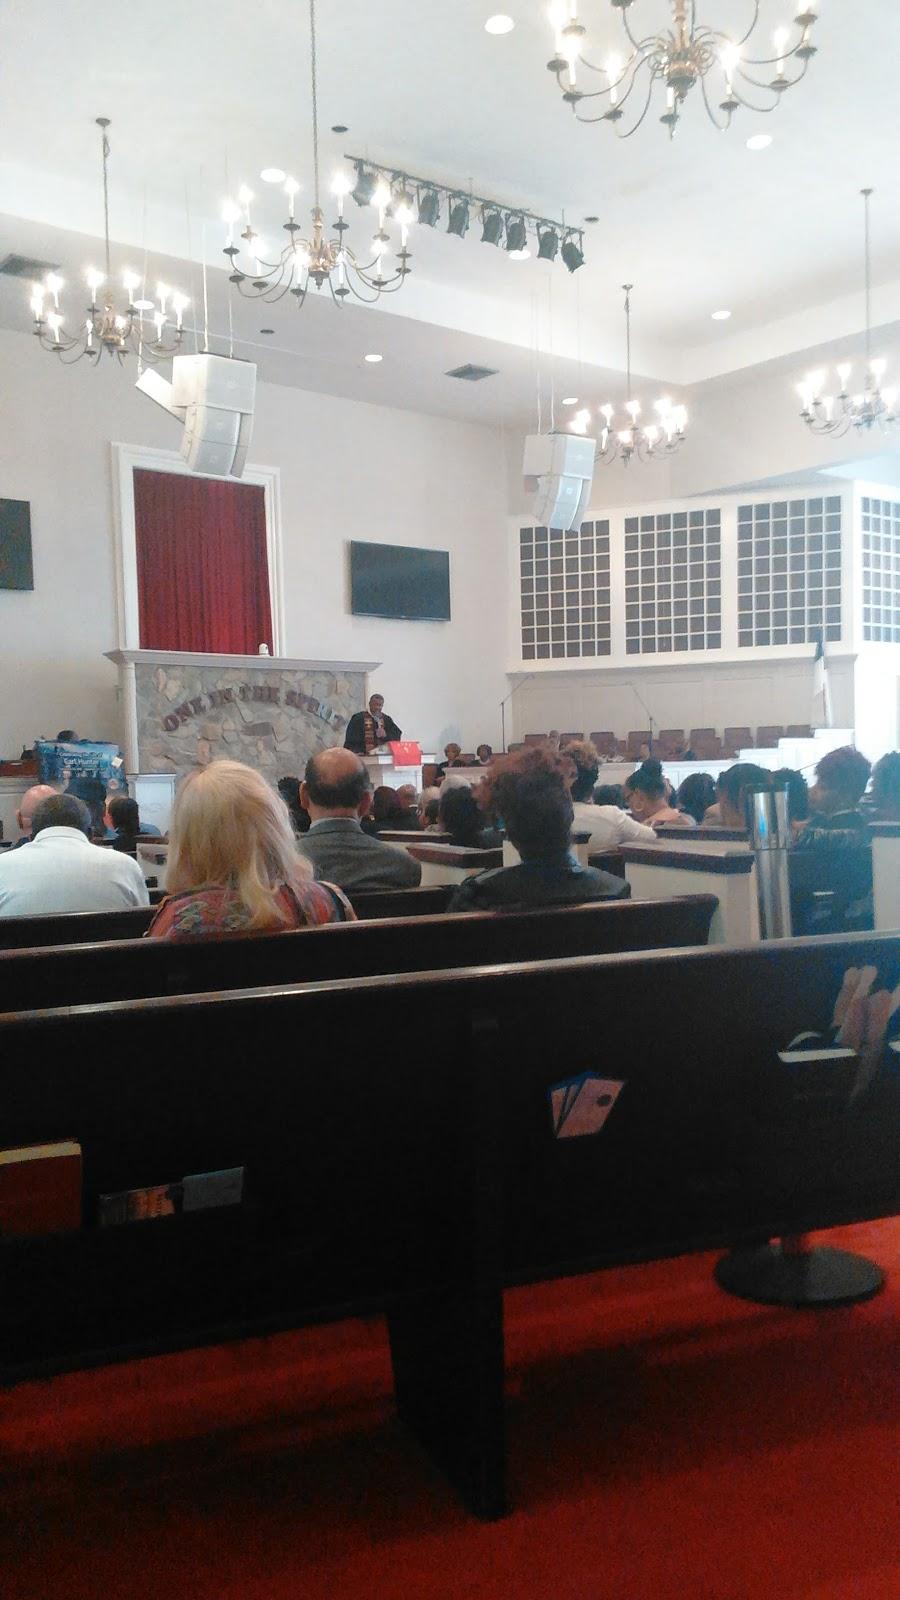 St. Stephen Baptist Church - church  | Photo 9 of 10 | Address: 5757 Temple Hill Rd, Camp Springs, MD 20748, USA | Phone: (301) 899-8885